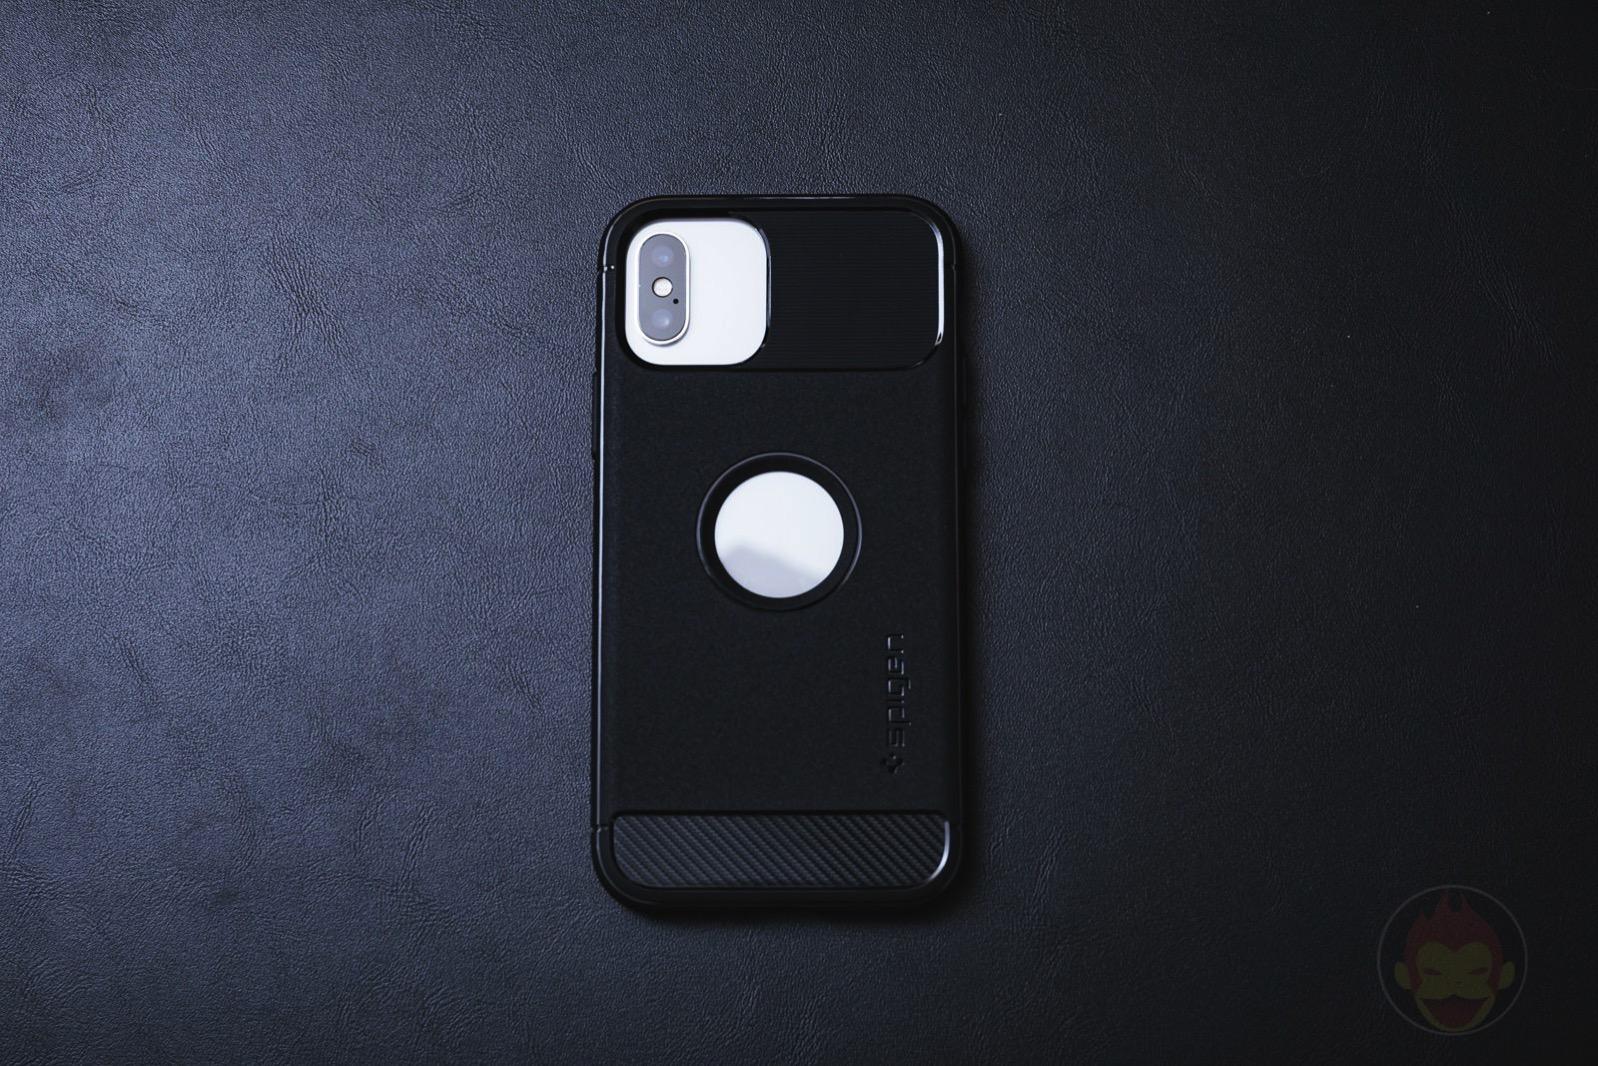 Spigen-iPhone-11-Pro-Case-Review-03.jpg